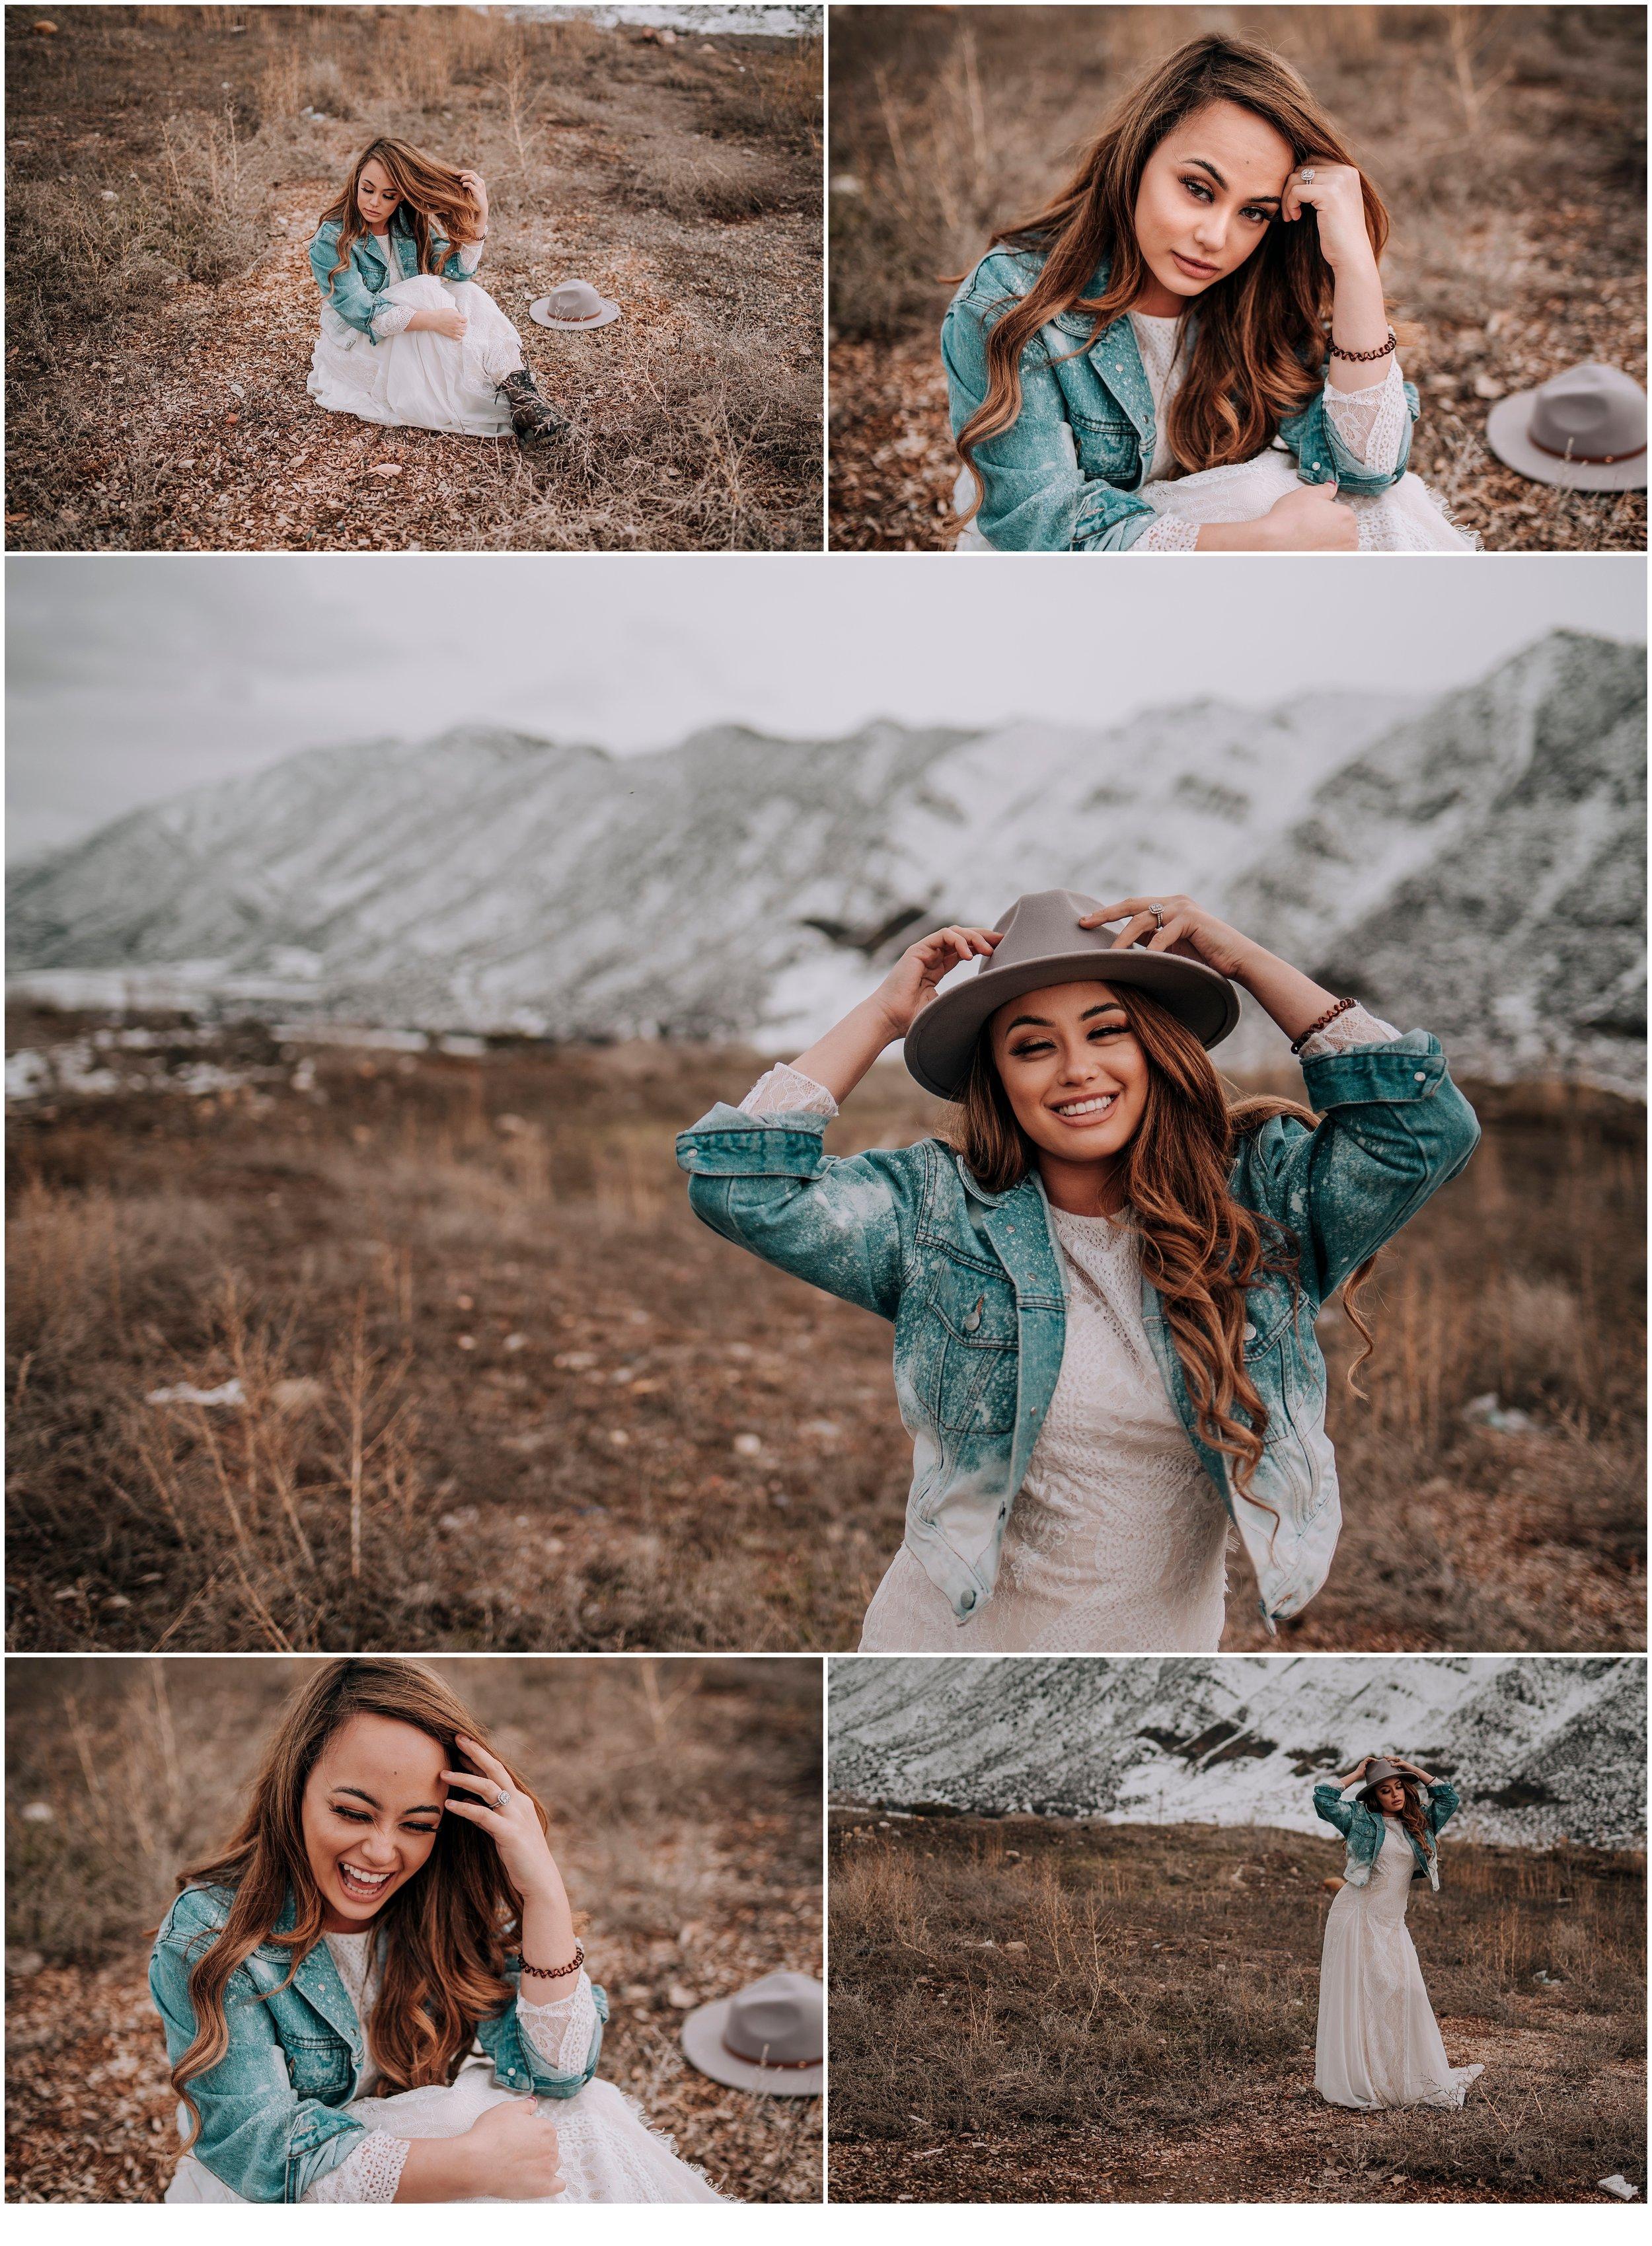 Breelle_Hilsenrath_Photography_Grand_Junction_Senior_Photographer